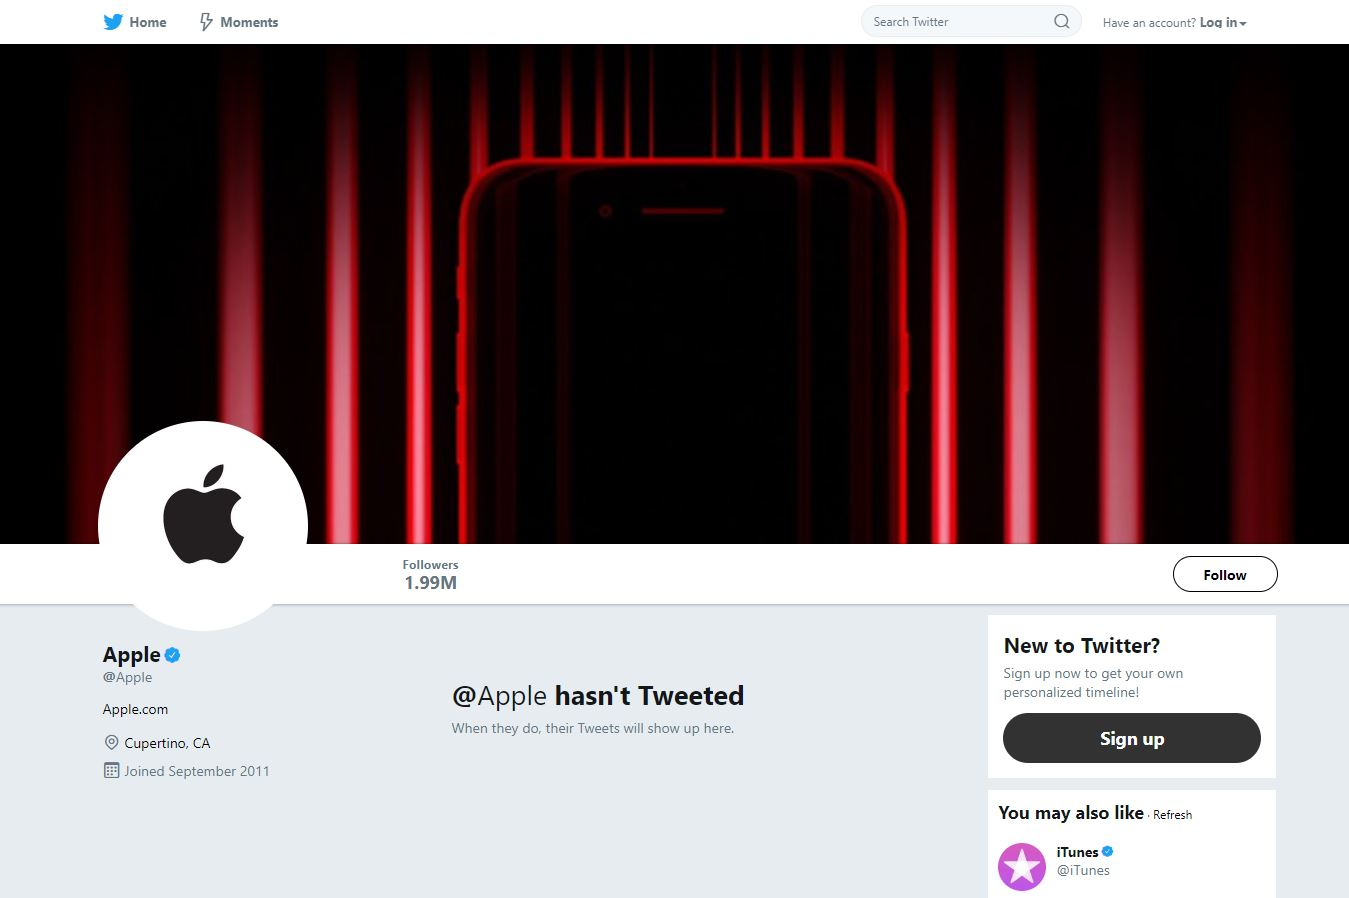 Apple's Twitter Profile